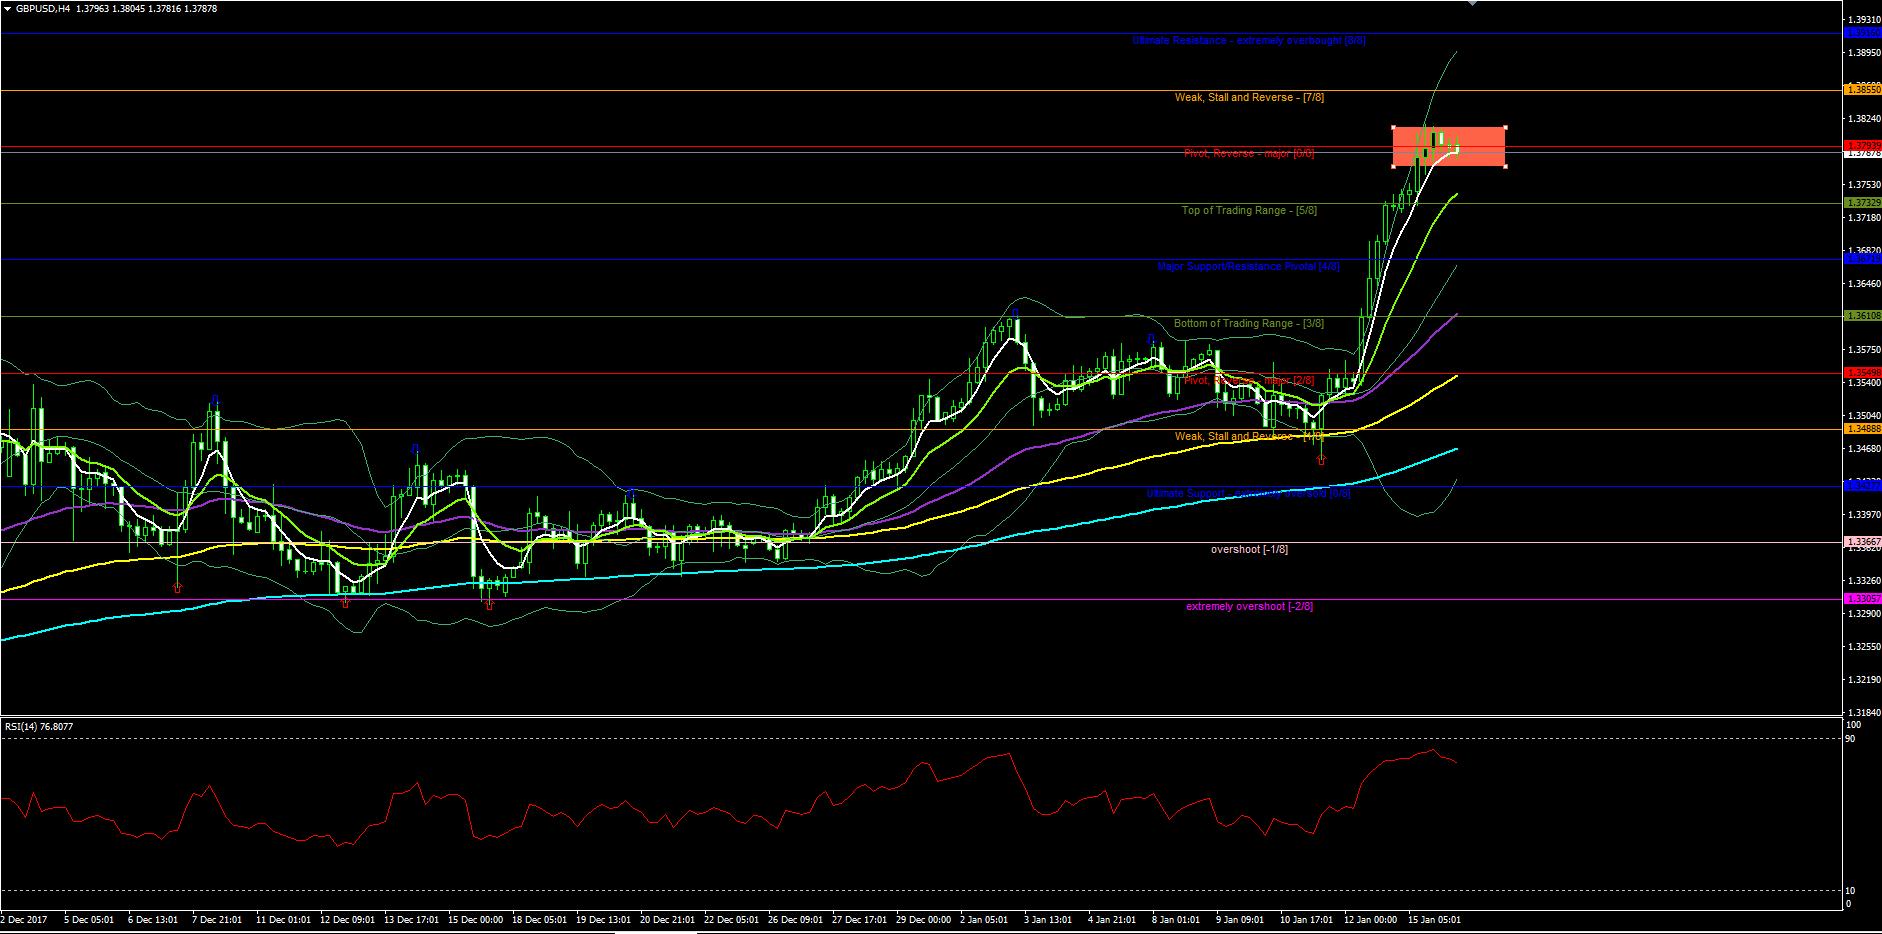 gbpusd-h4-chart.png